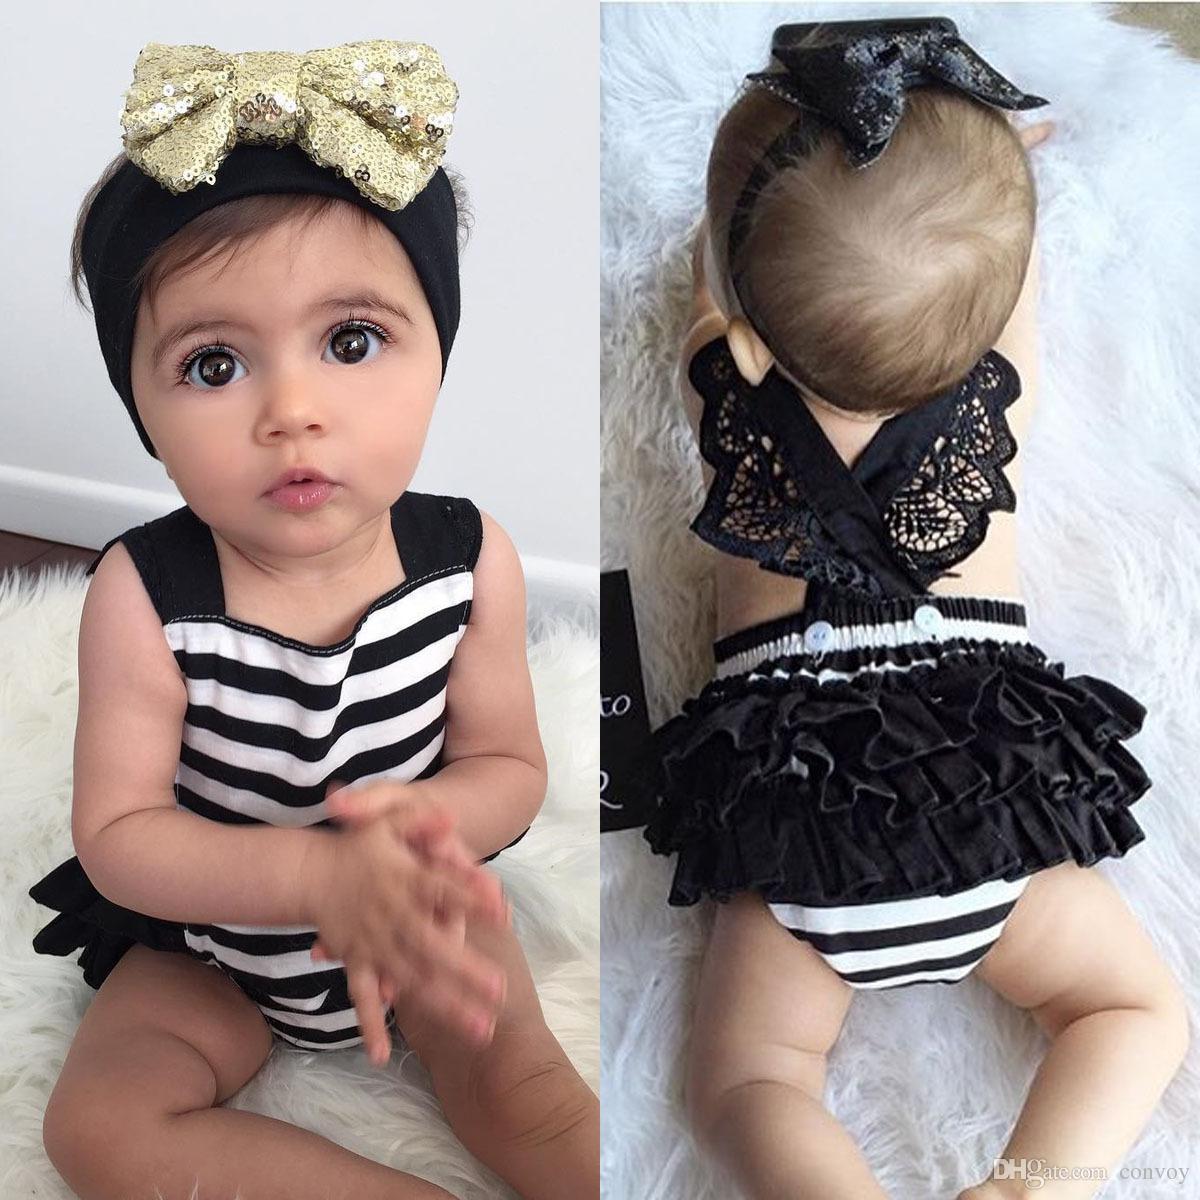 98323c1e286 2019 Baby Girl Pant Headband Stripe Lace Rompers With Tutu Skirt Sequin Bow  Headbands Set Kids Children Cross Backside Bodysuits KST04 From Convoy